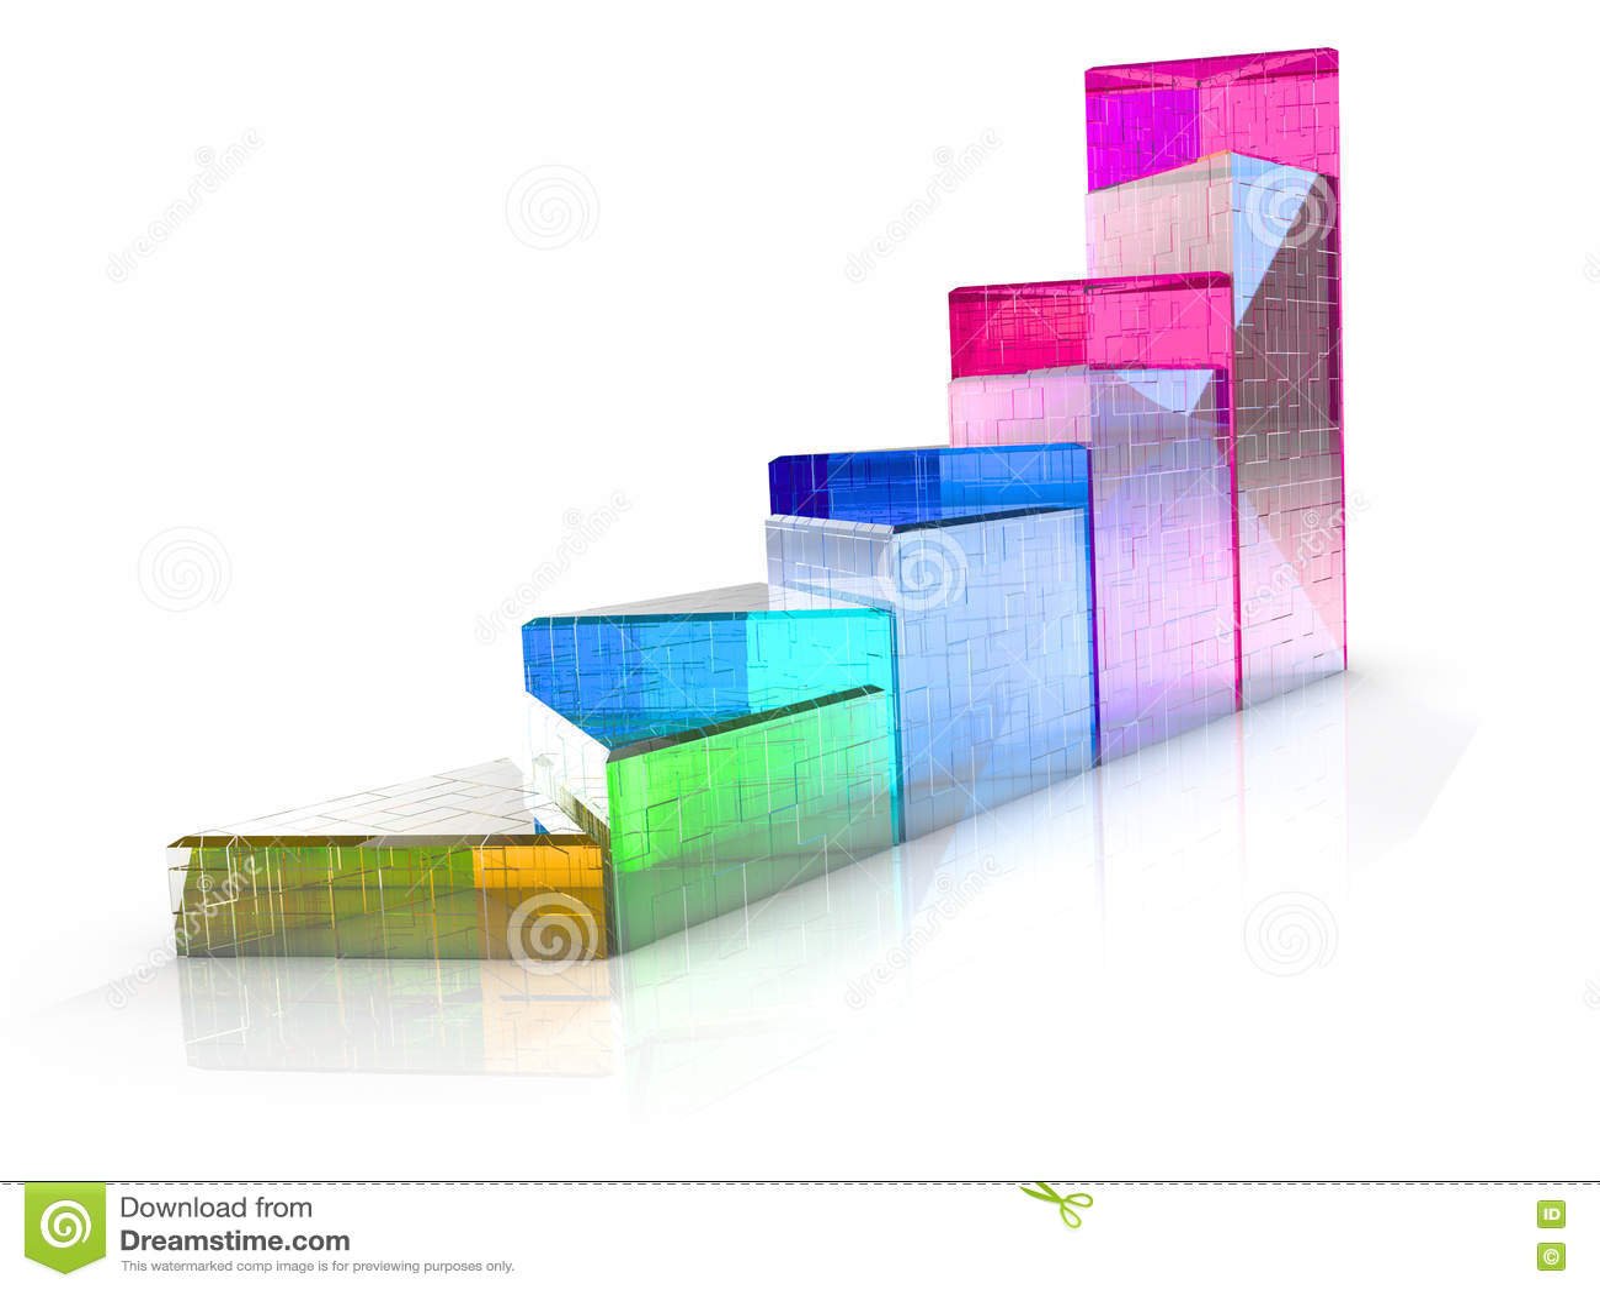 triangular diagram translucent colored items d illustration 76228552 triangular diagram of the translucent colored items stock